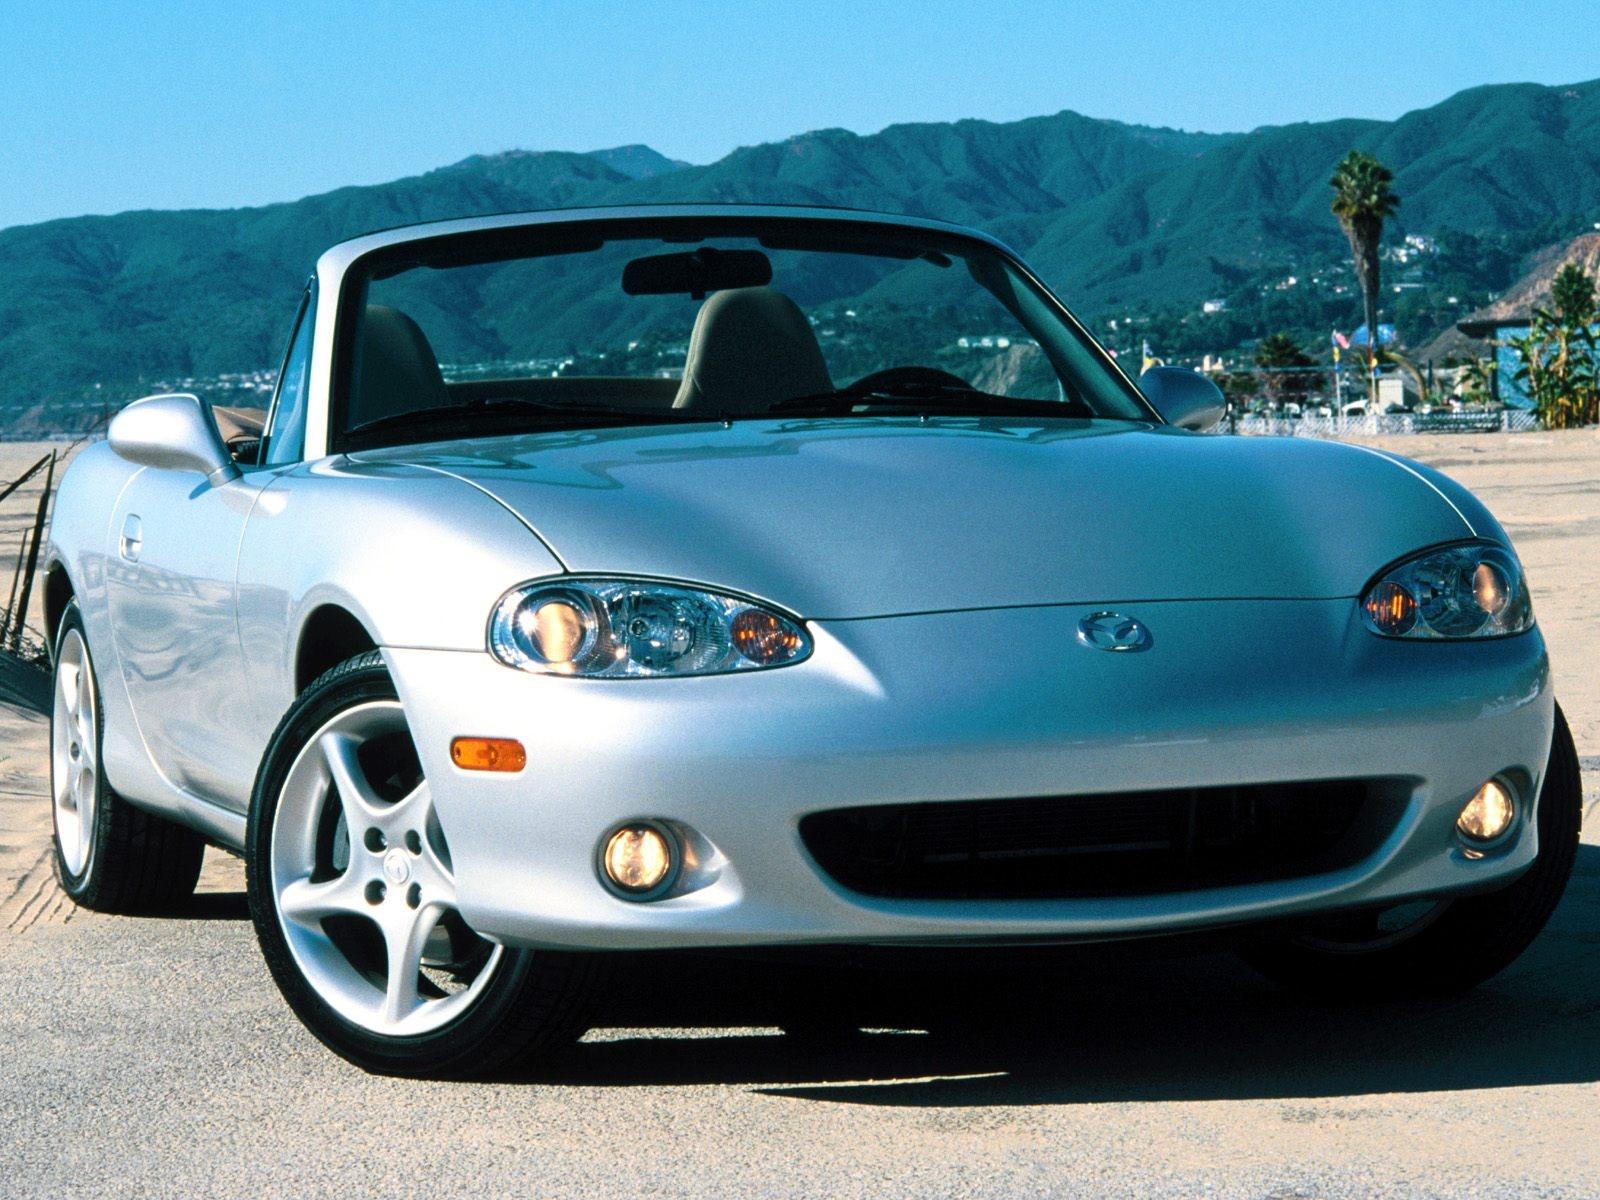 Used Lexus Rx >> 2002 Mazda MX-5 Miata - Overview - CarGurus